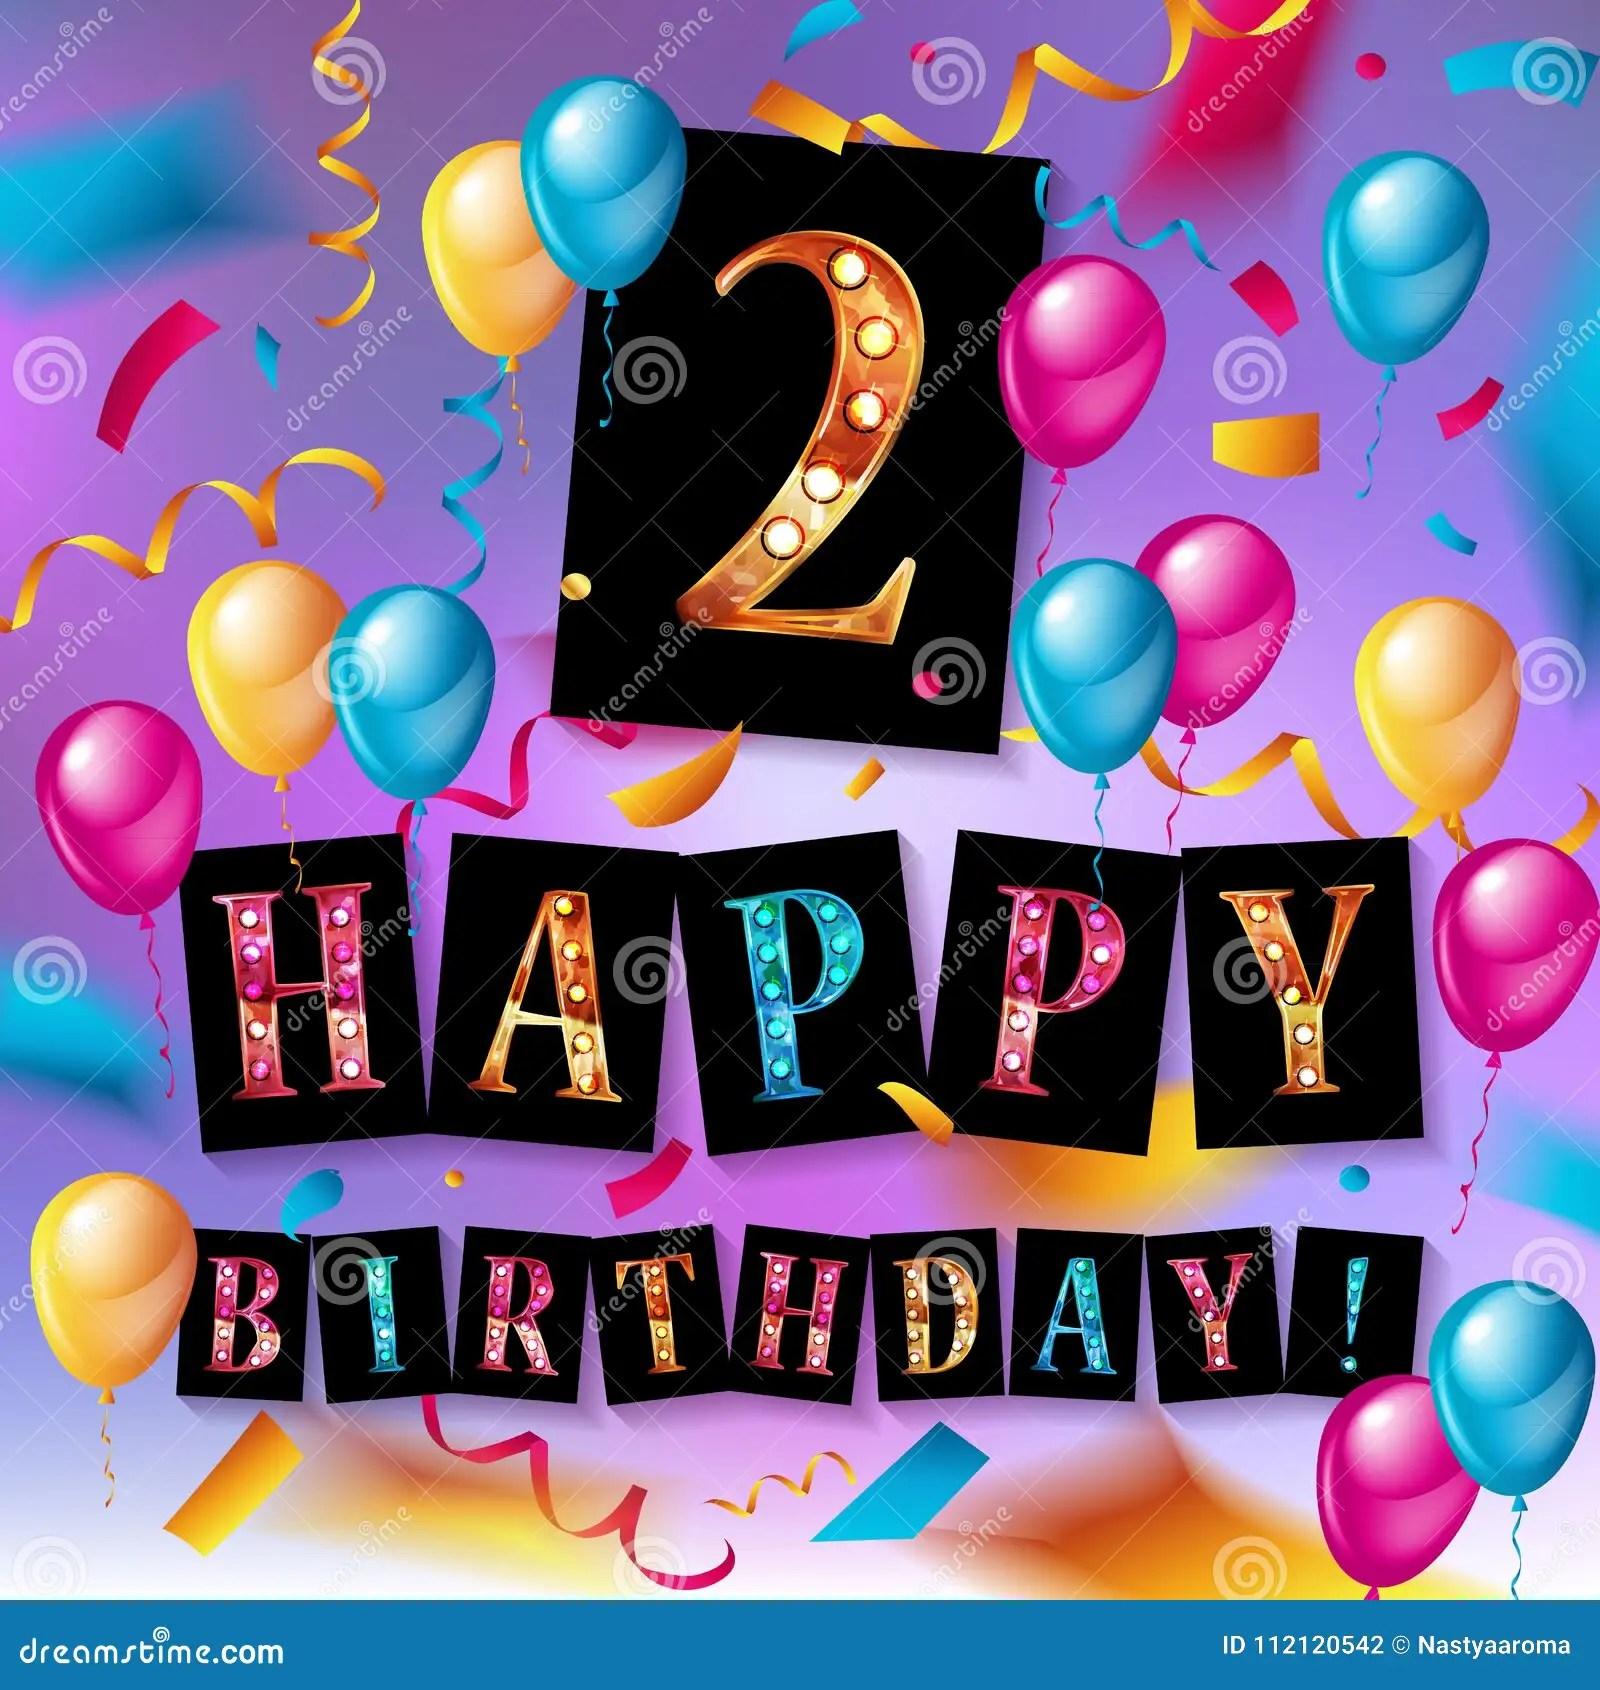 2nd Birthday Celebration Greeting Card Design Stock Illustration Illustration Of Gift Design 112120542